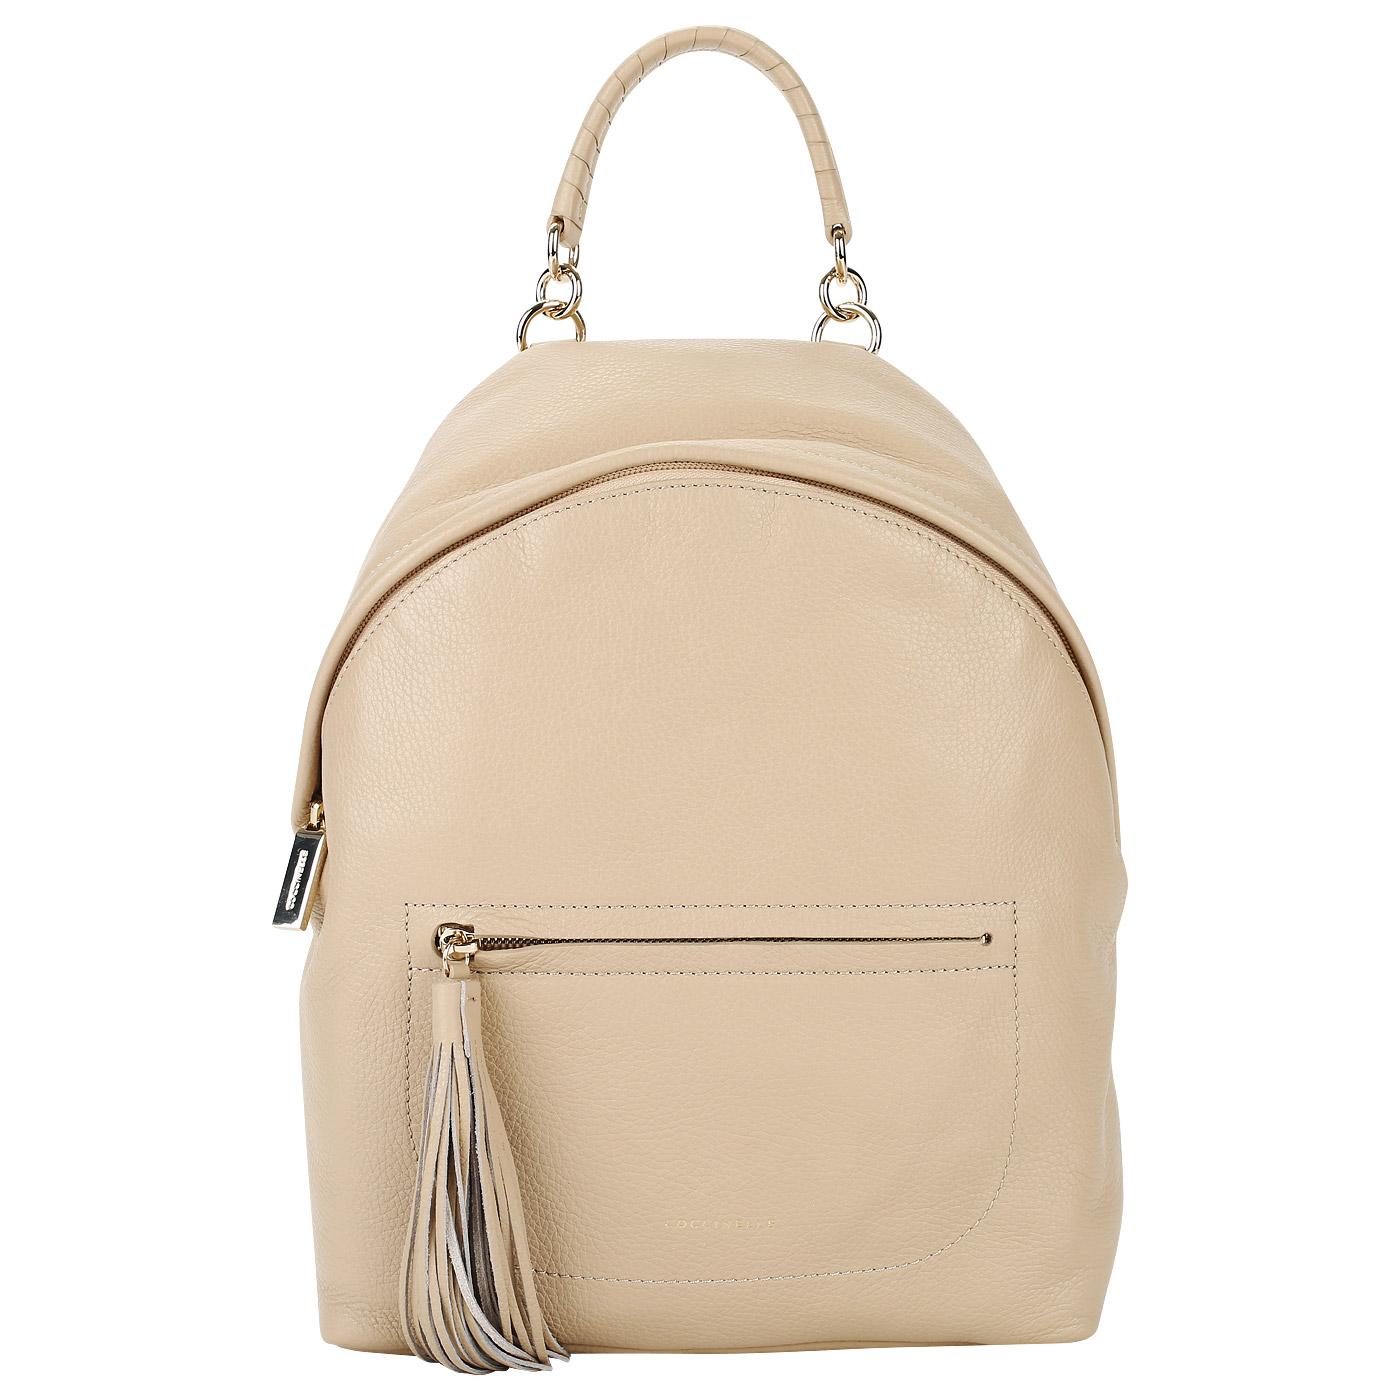 6c093f2d614c ... Женский кожаный рюкзак с регулируемыми лямками Coccinelle Leonie ...